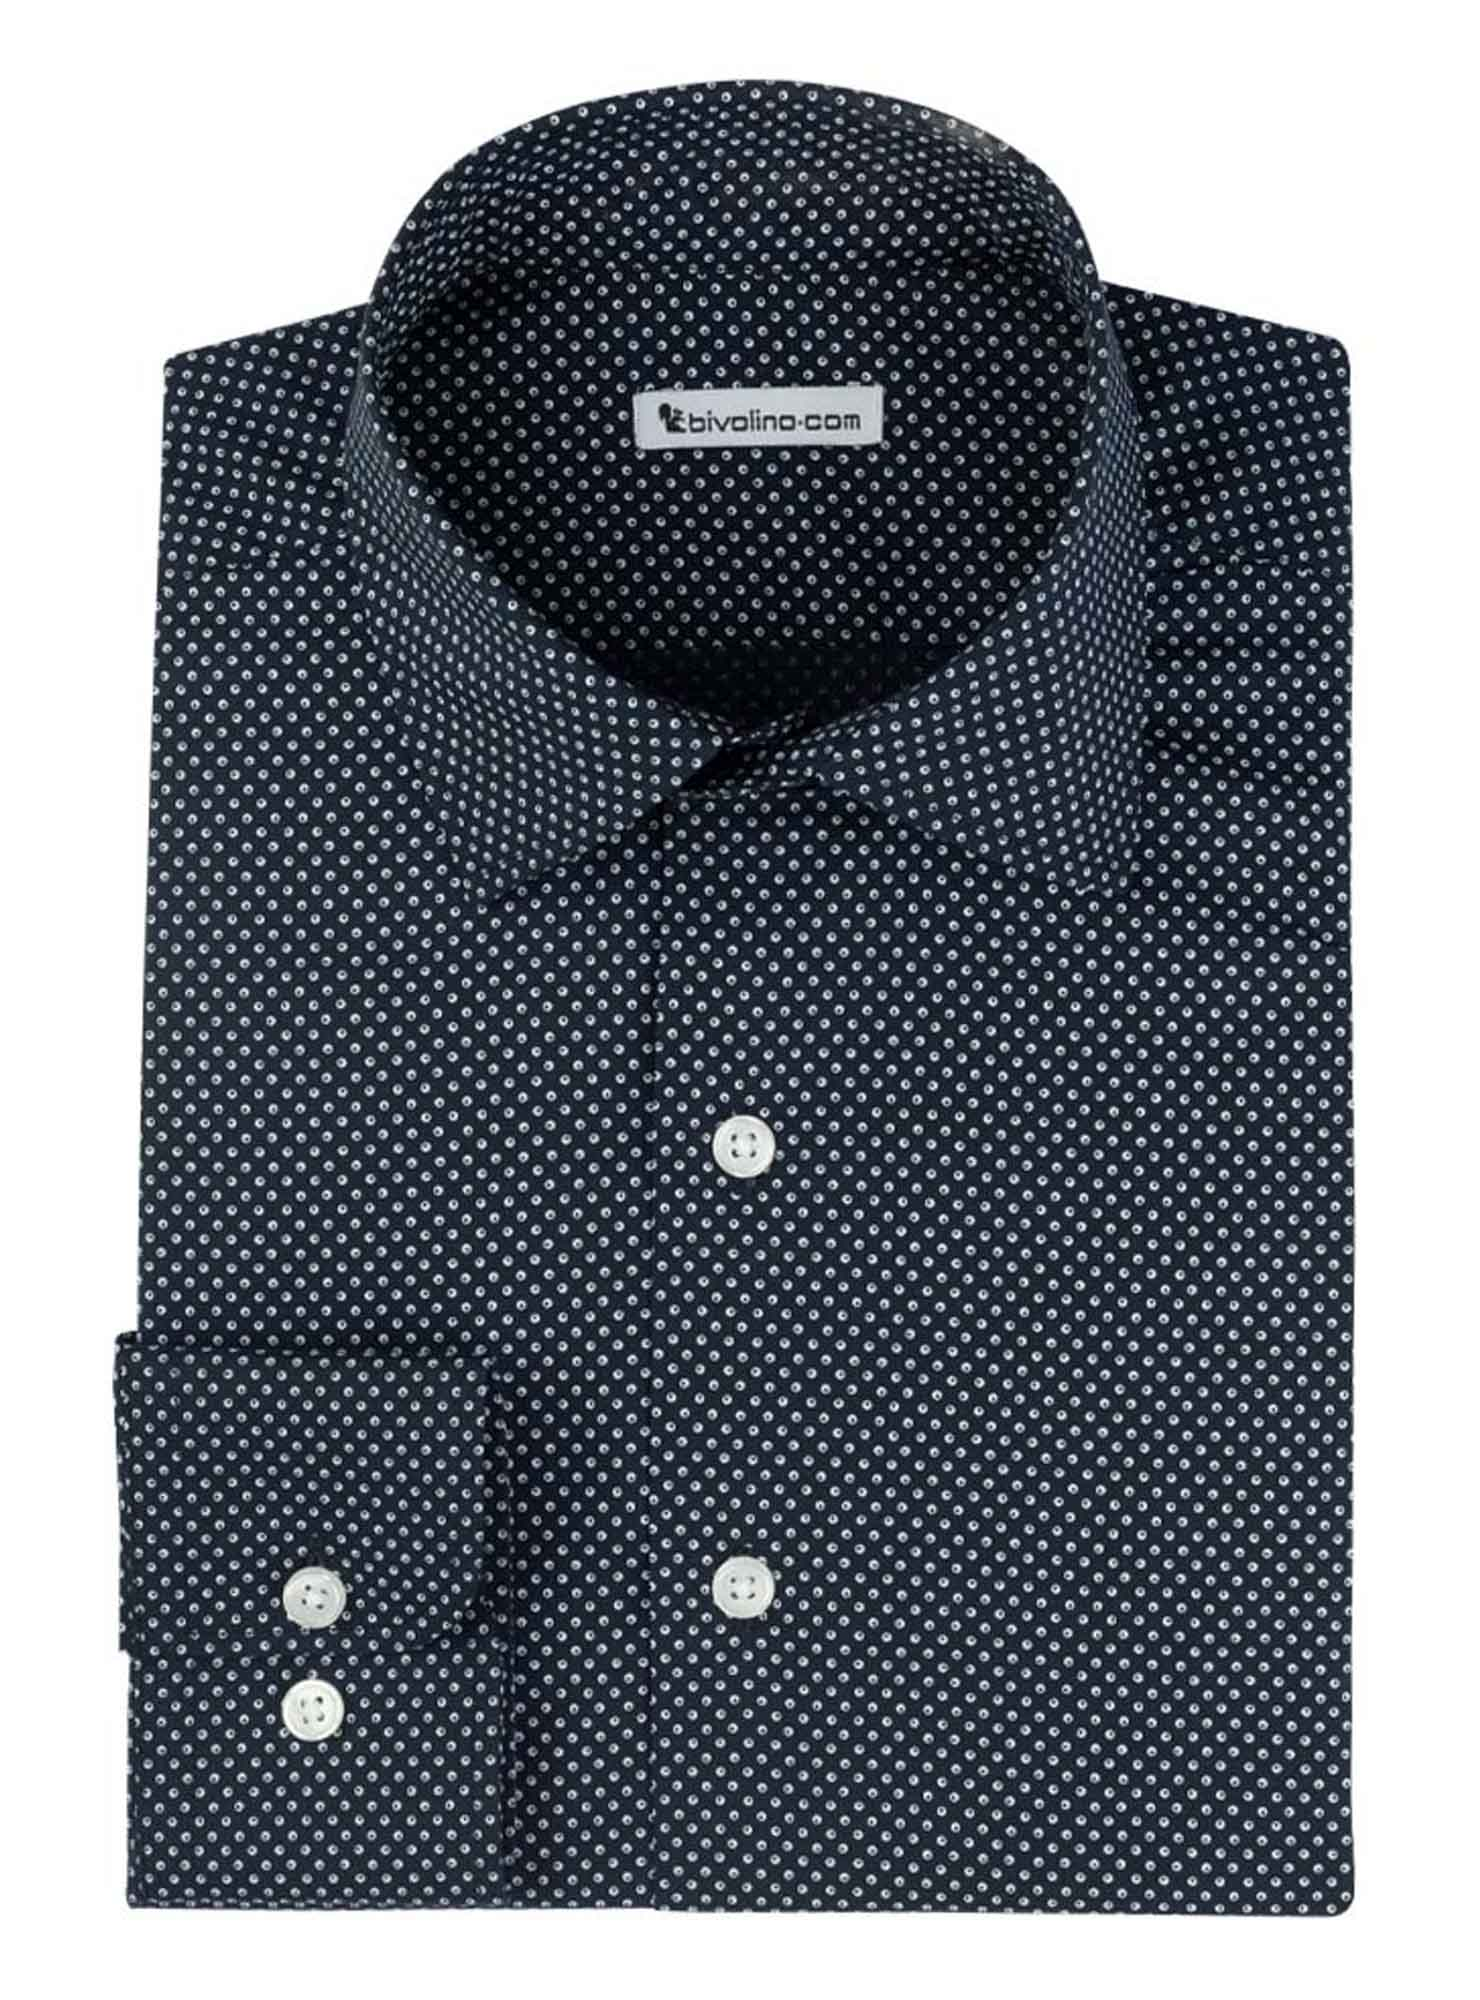 LARIANO  - Men's shirt cotton Micro-Print dots - MICRO 8